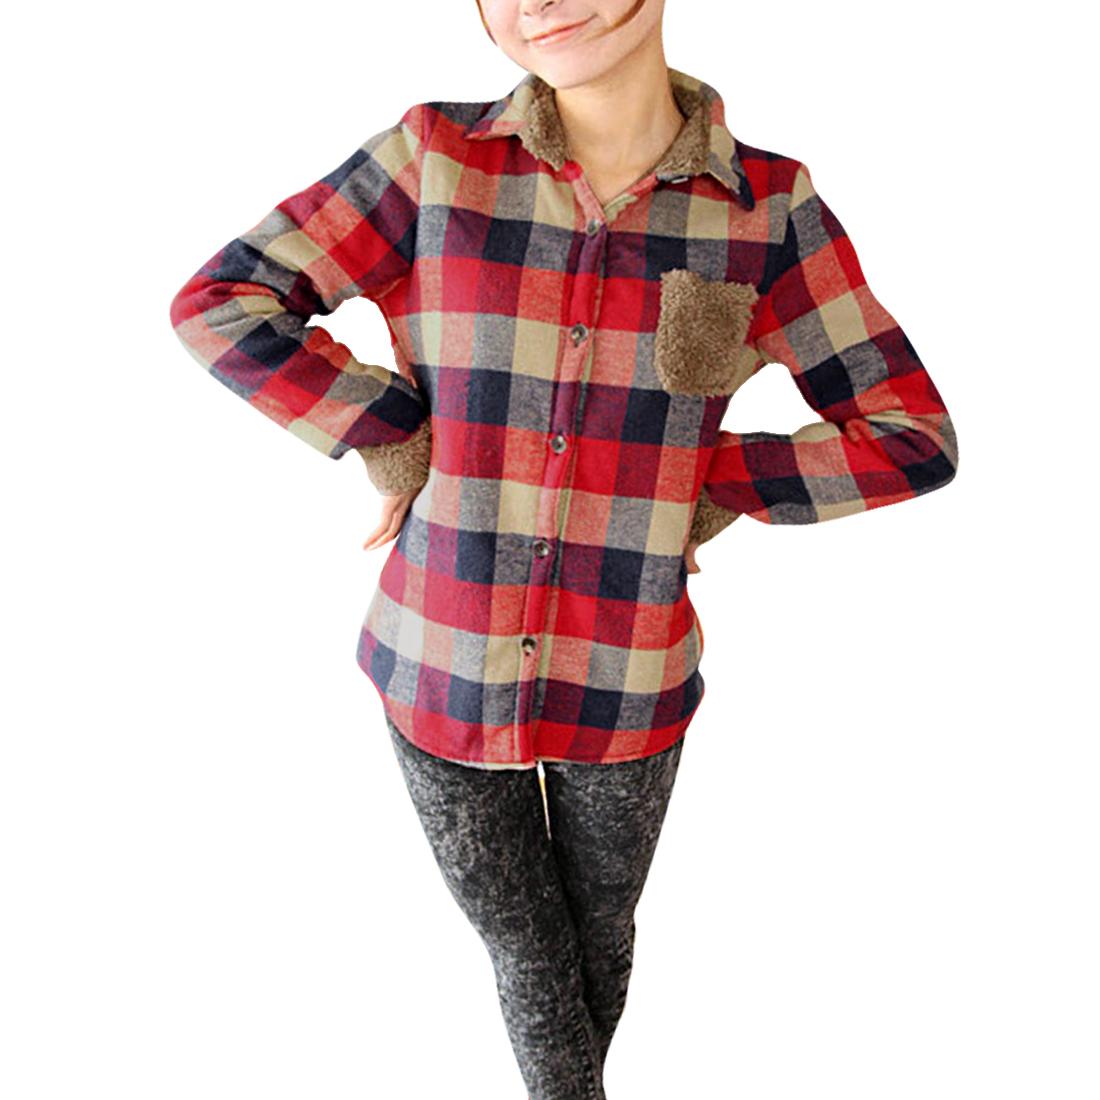 Women Long Sleeved Button Front Red Khaki Plaids Top Shirt S